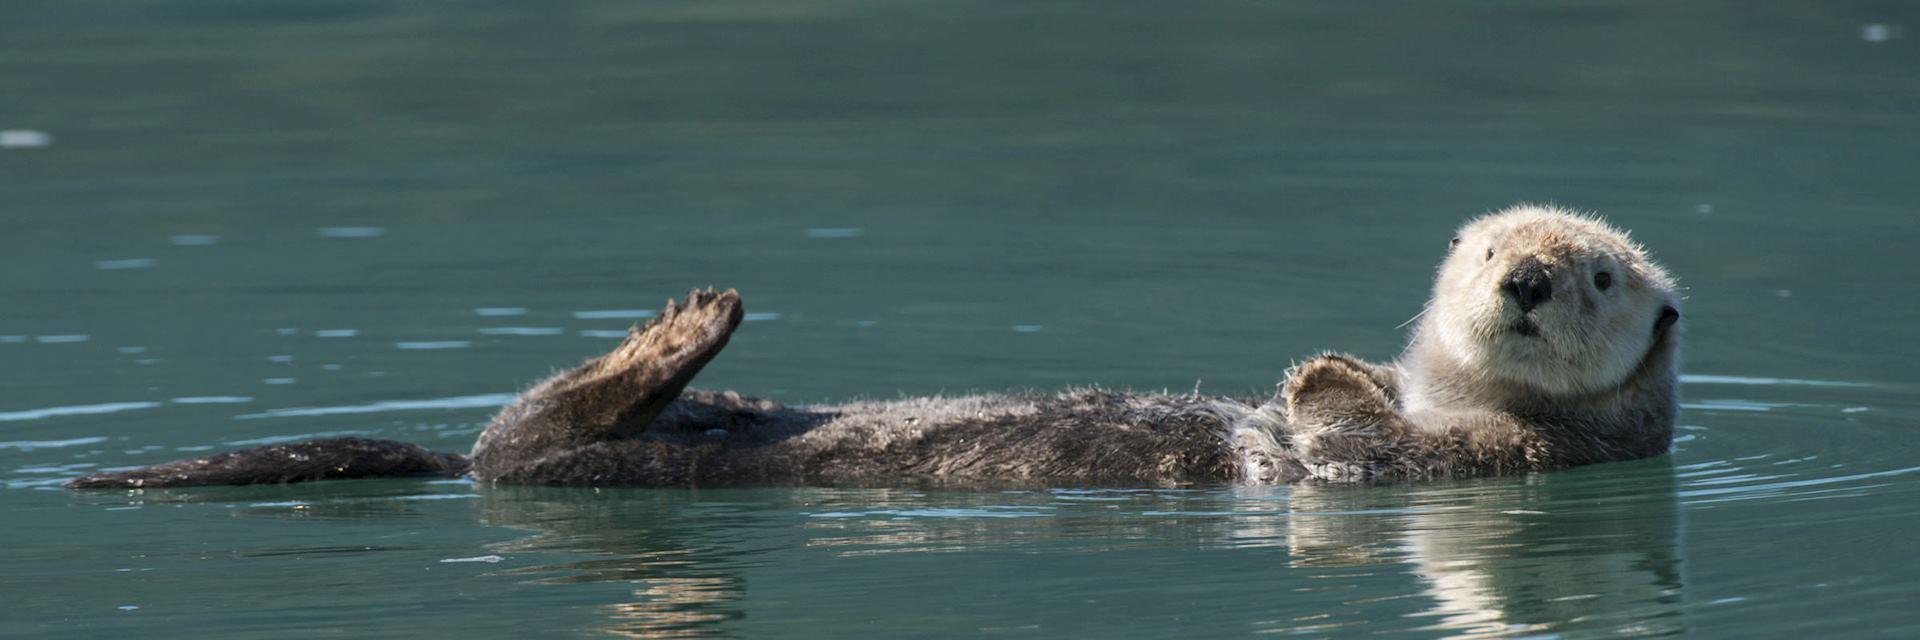 Otter in Prince William Sound